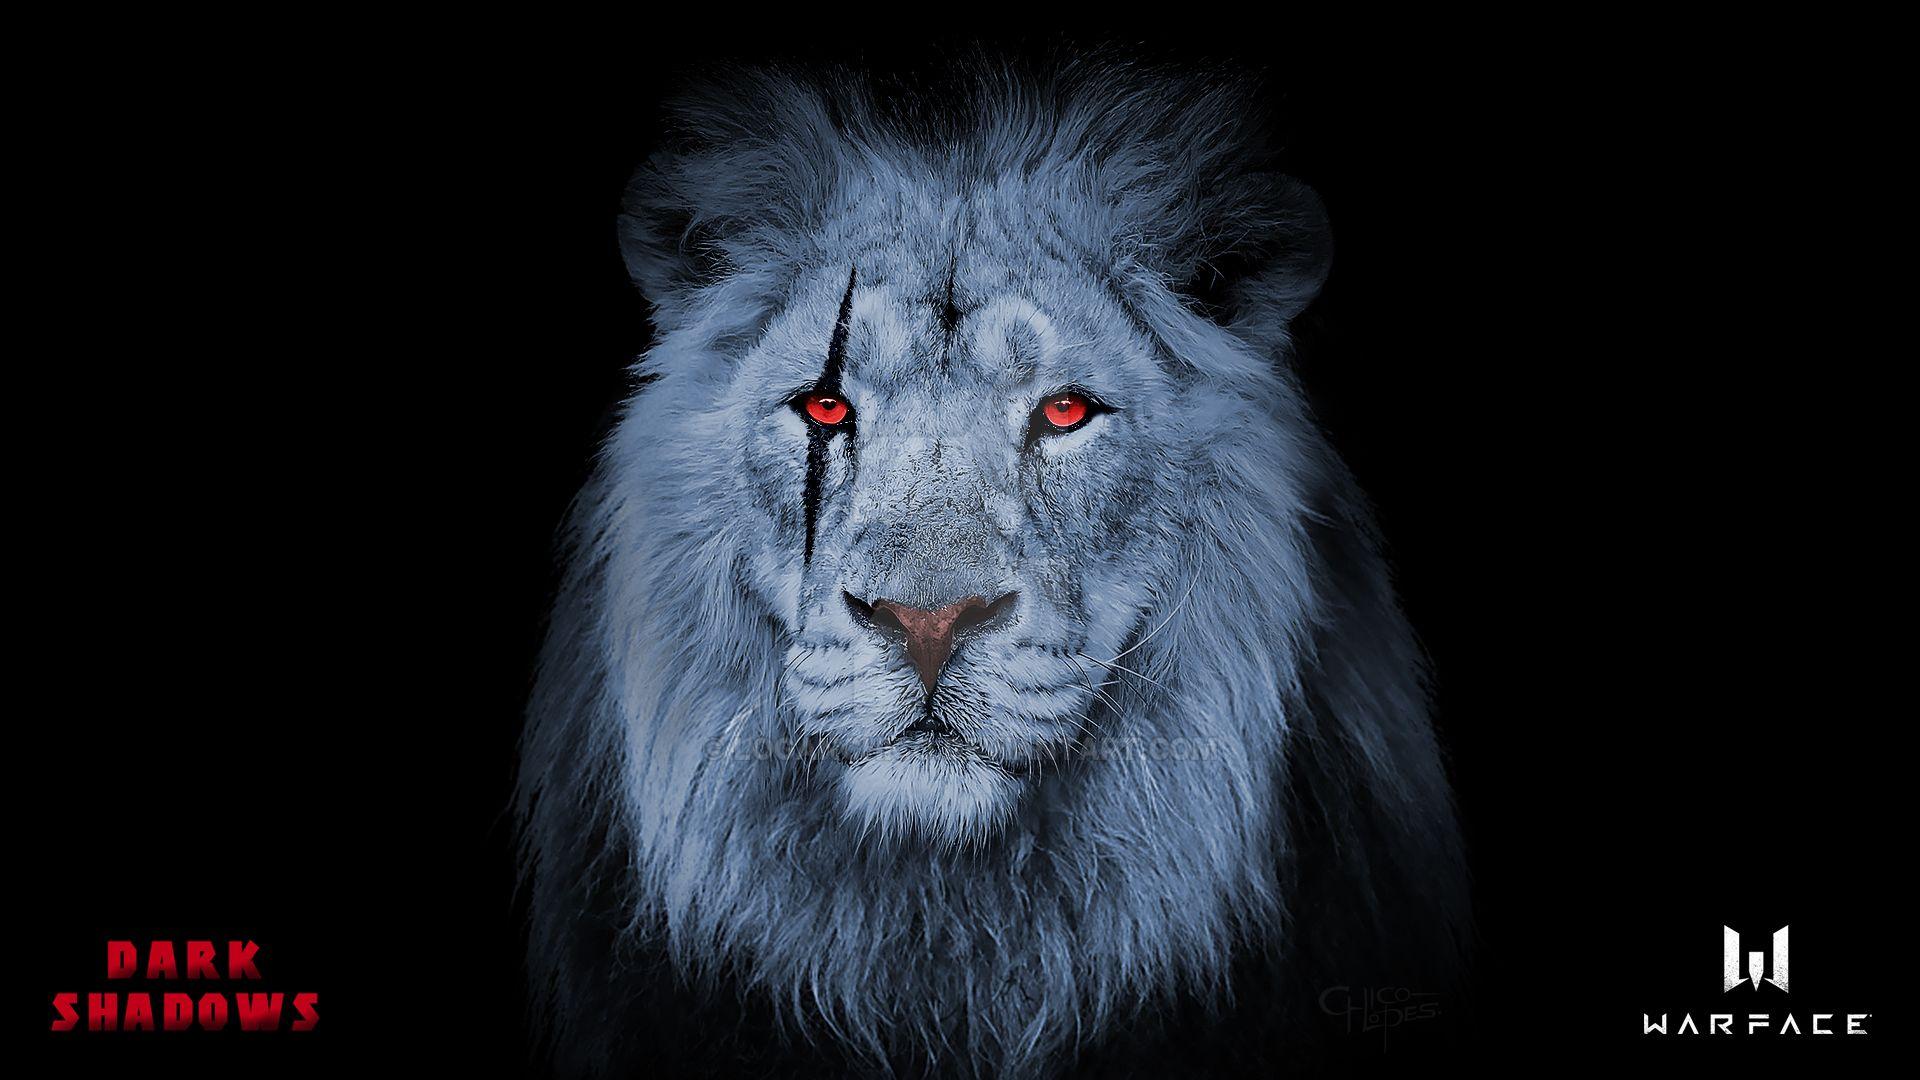 Scar the lion dark shadows clan wallpaper 01 by loganchico on scar the lion dark shadows clan wallpaper 01 by loganchico publicscrutiny Image collections